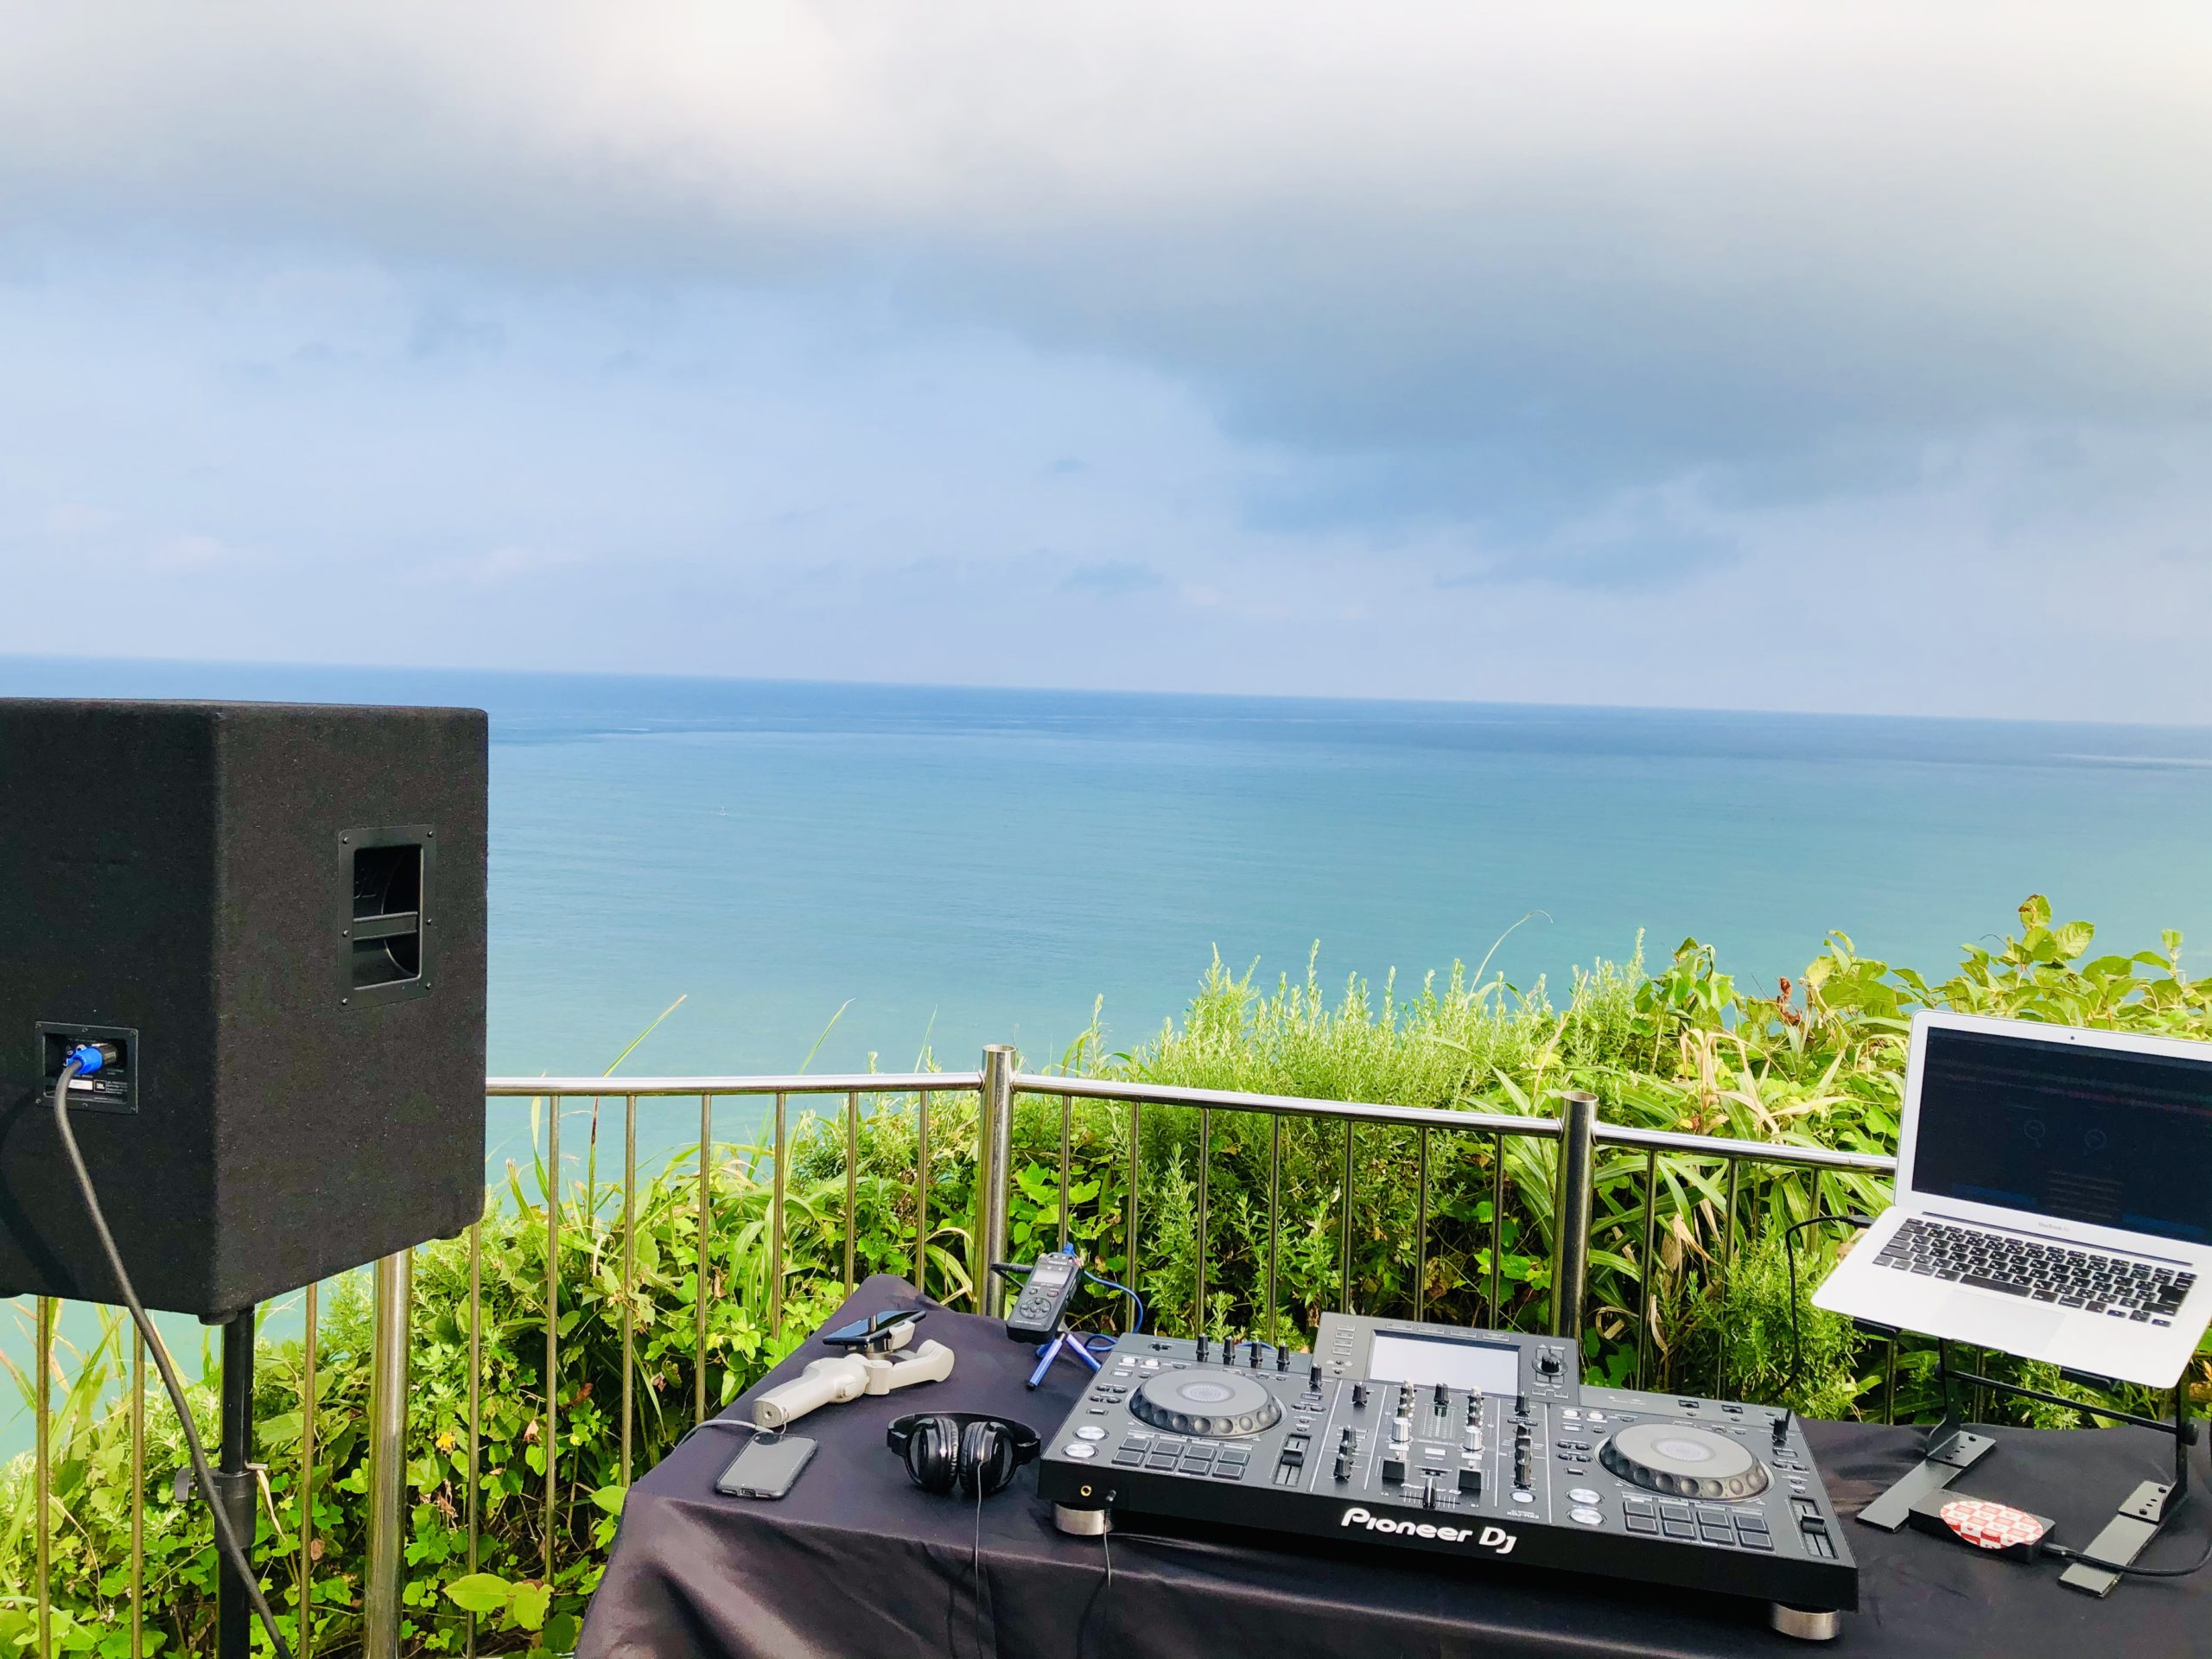 DJ イベント アウトドア 灯台 フェス DJI ドローン